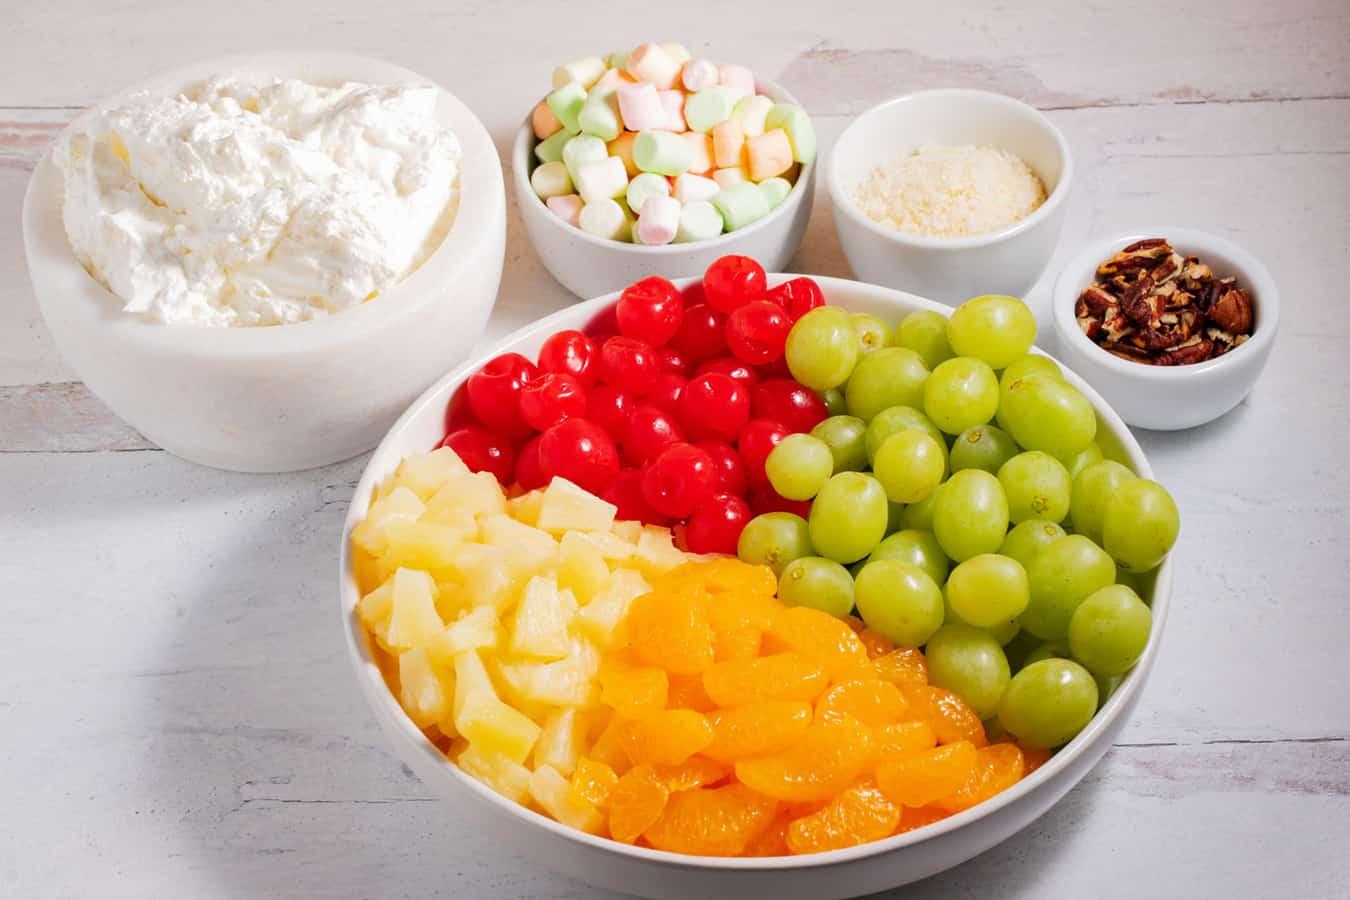 ingredients of ambrosia salad: mandarin oranges, pineapple, grapes, maraschino cherries, creamy sauce, marshmallows, coconut, and pecans